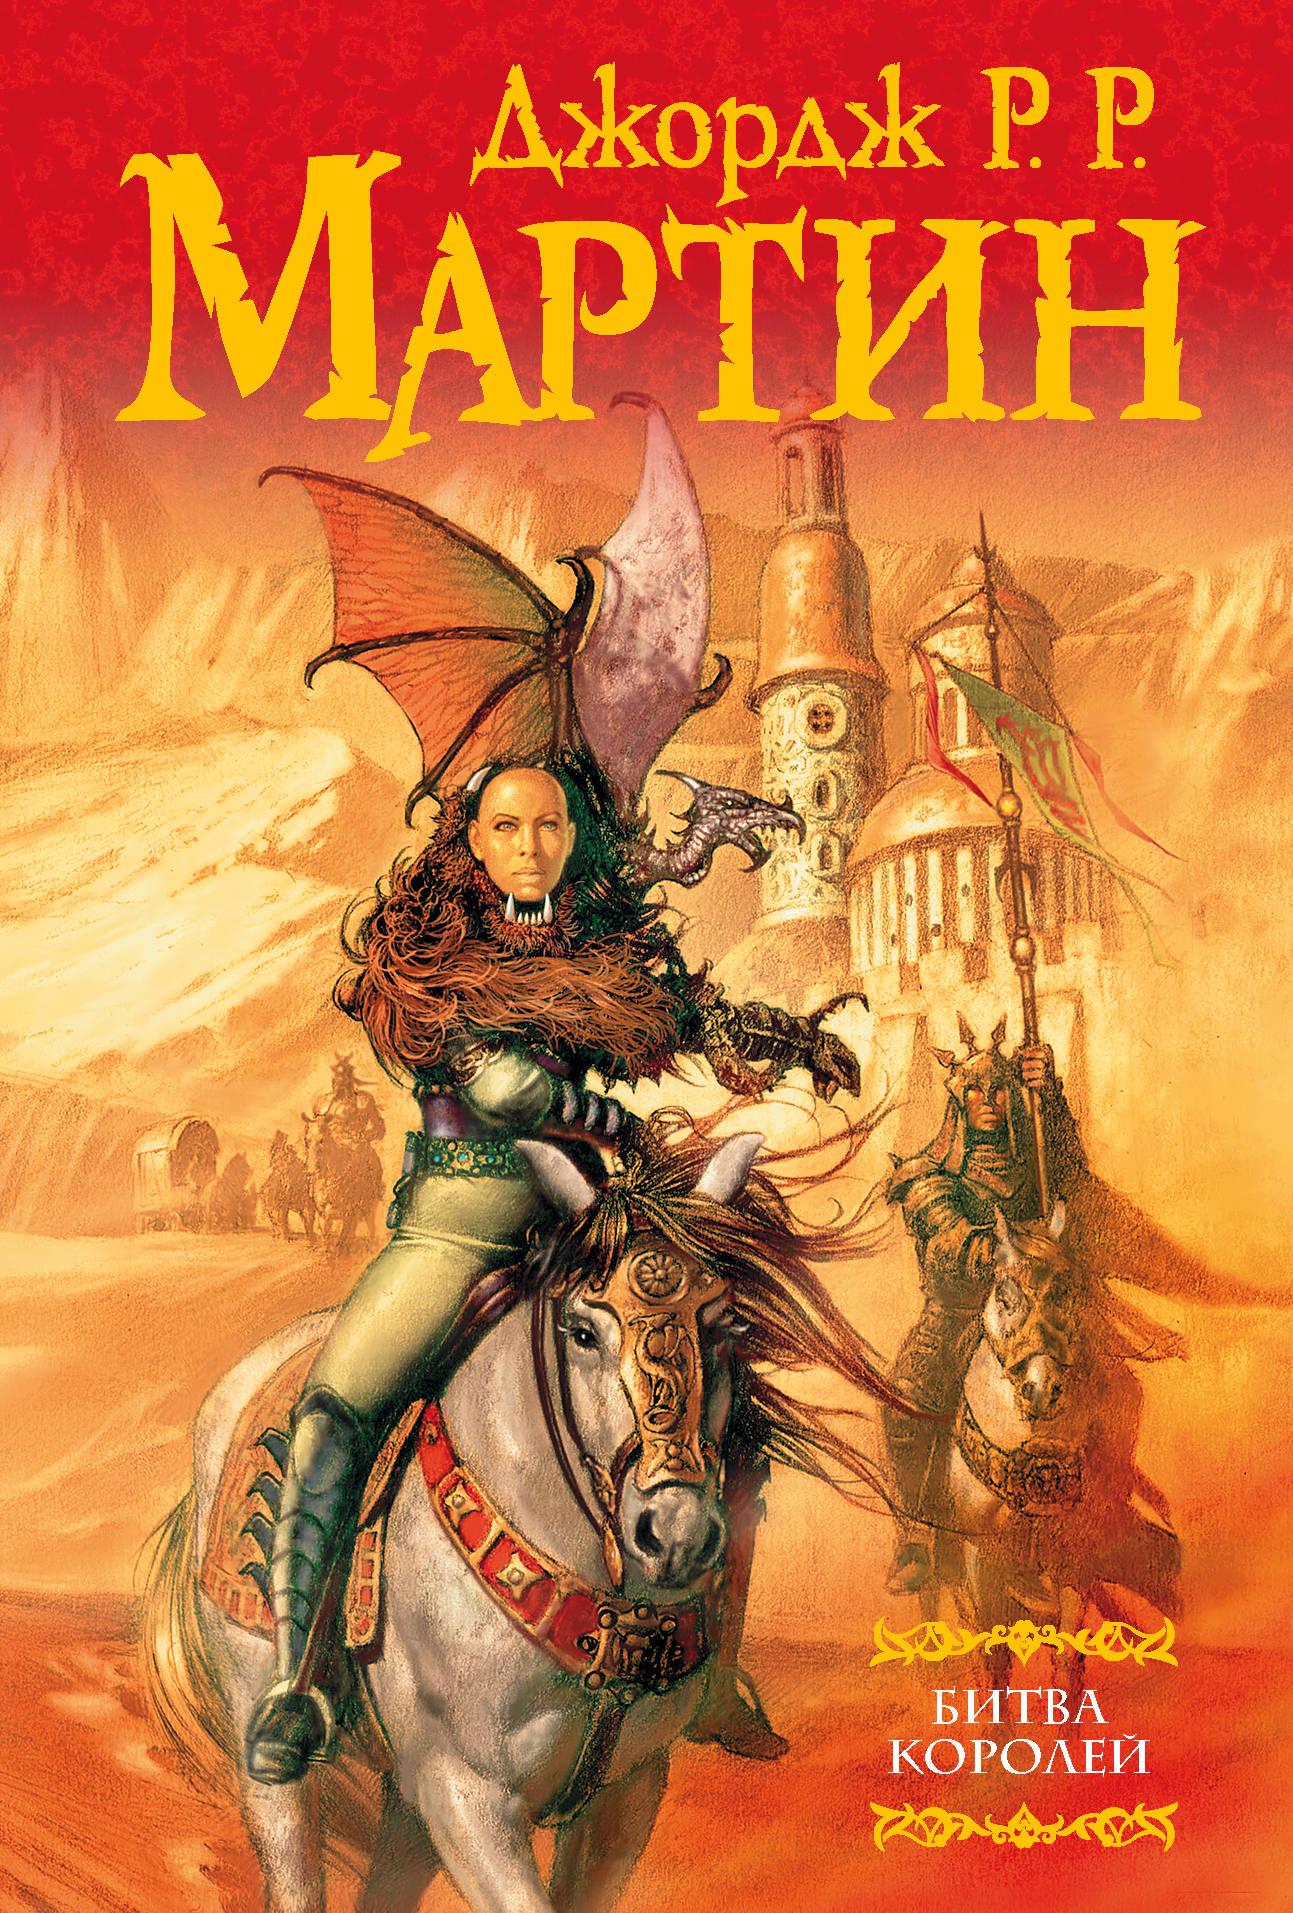 Мартин Д. Битва королей джордж р р мартин буря мечей часть 3